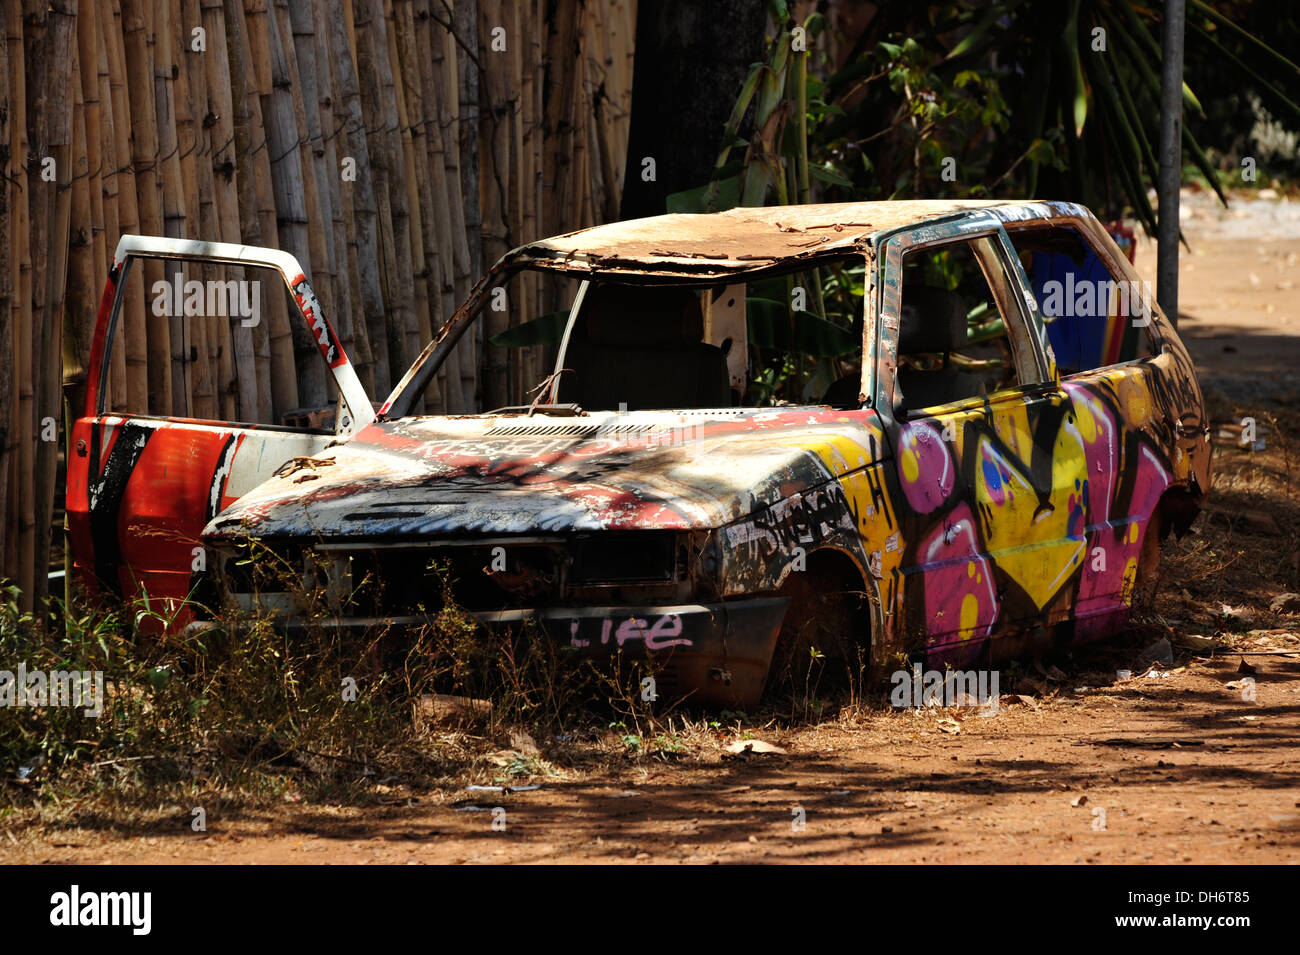 Car wreck with graffiti, Itacaré, Bahia, Brazil. - Stock Image